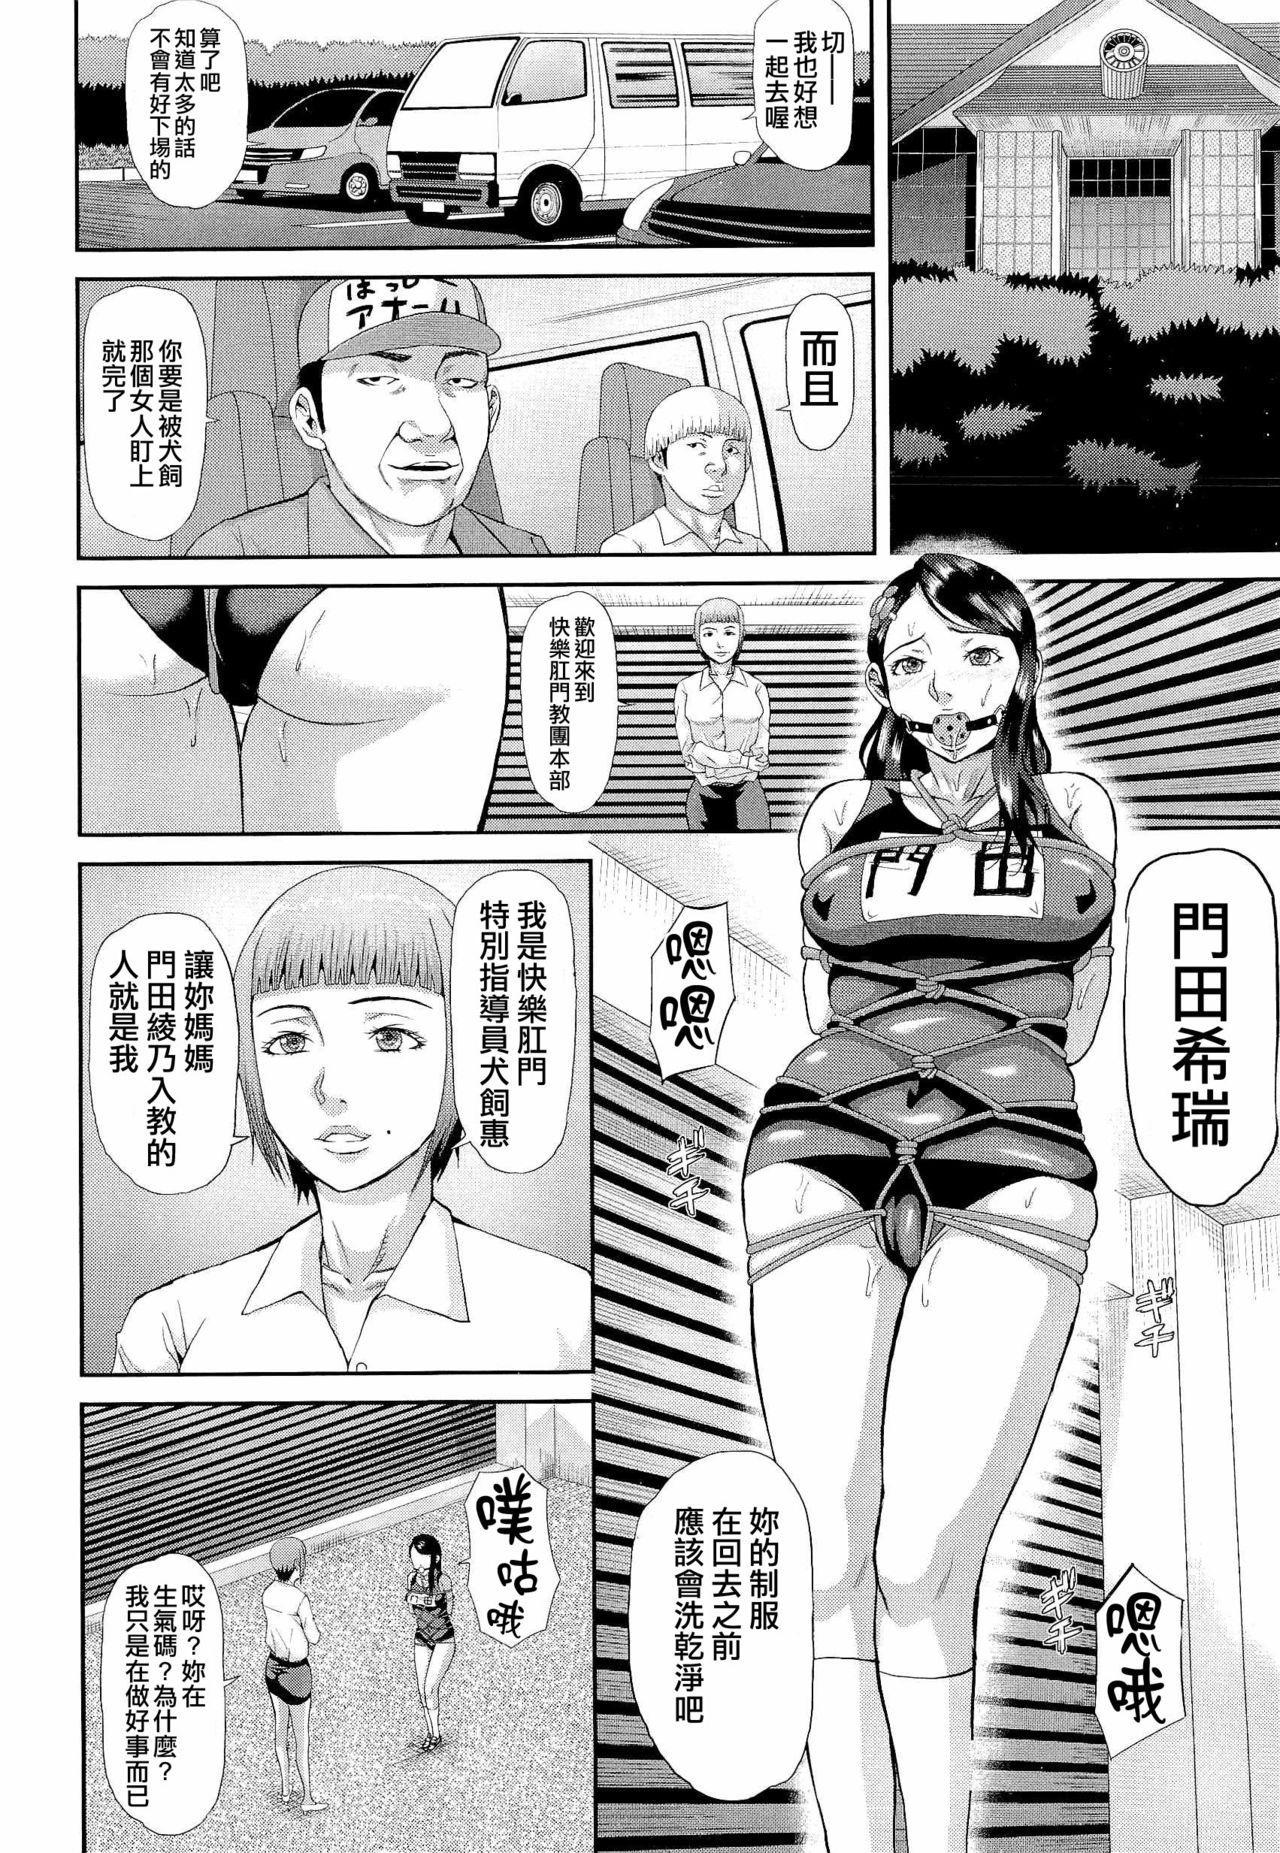 [Honebuto Danshaku] Innou Kaizou Program ~Oyako Zecchou Cult Ochi~ [Chinese]【不想记名重嵌--高质量图源】 70